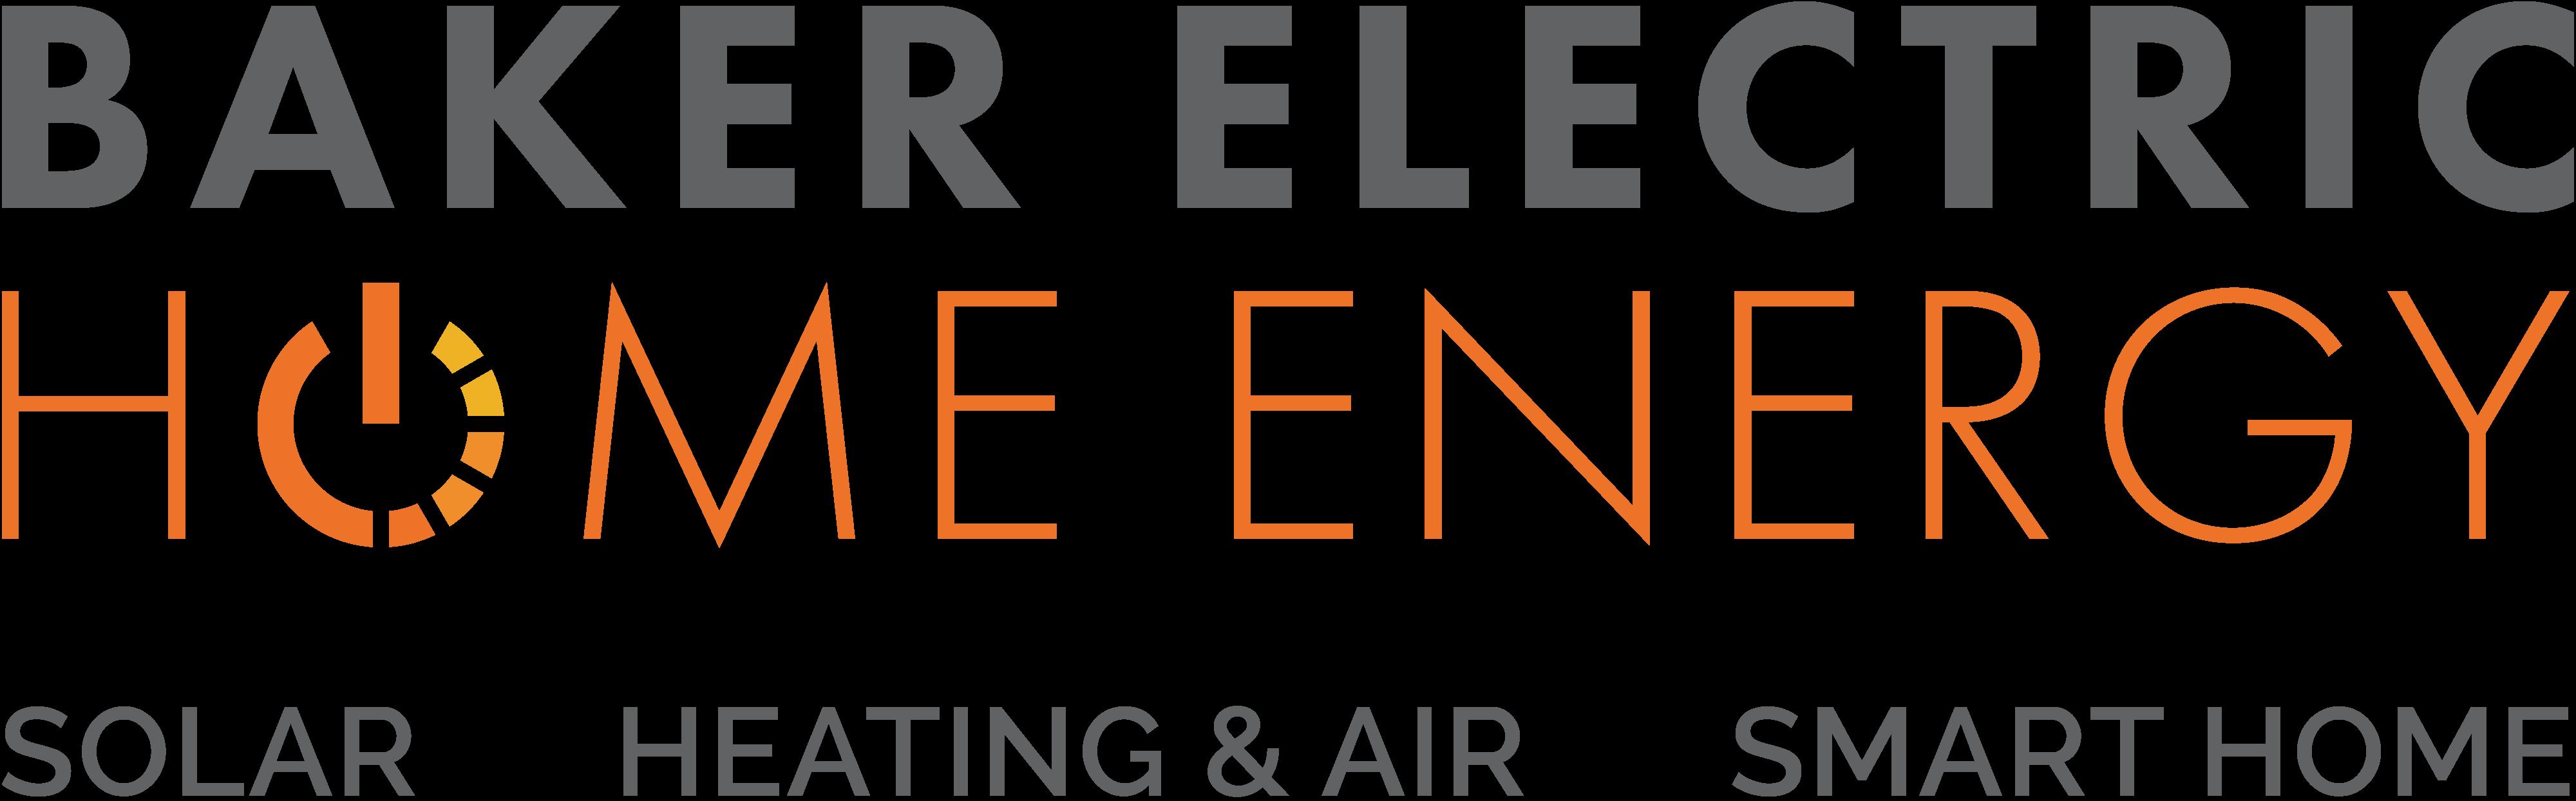 Baker Electric Home Energy Logo